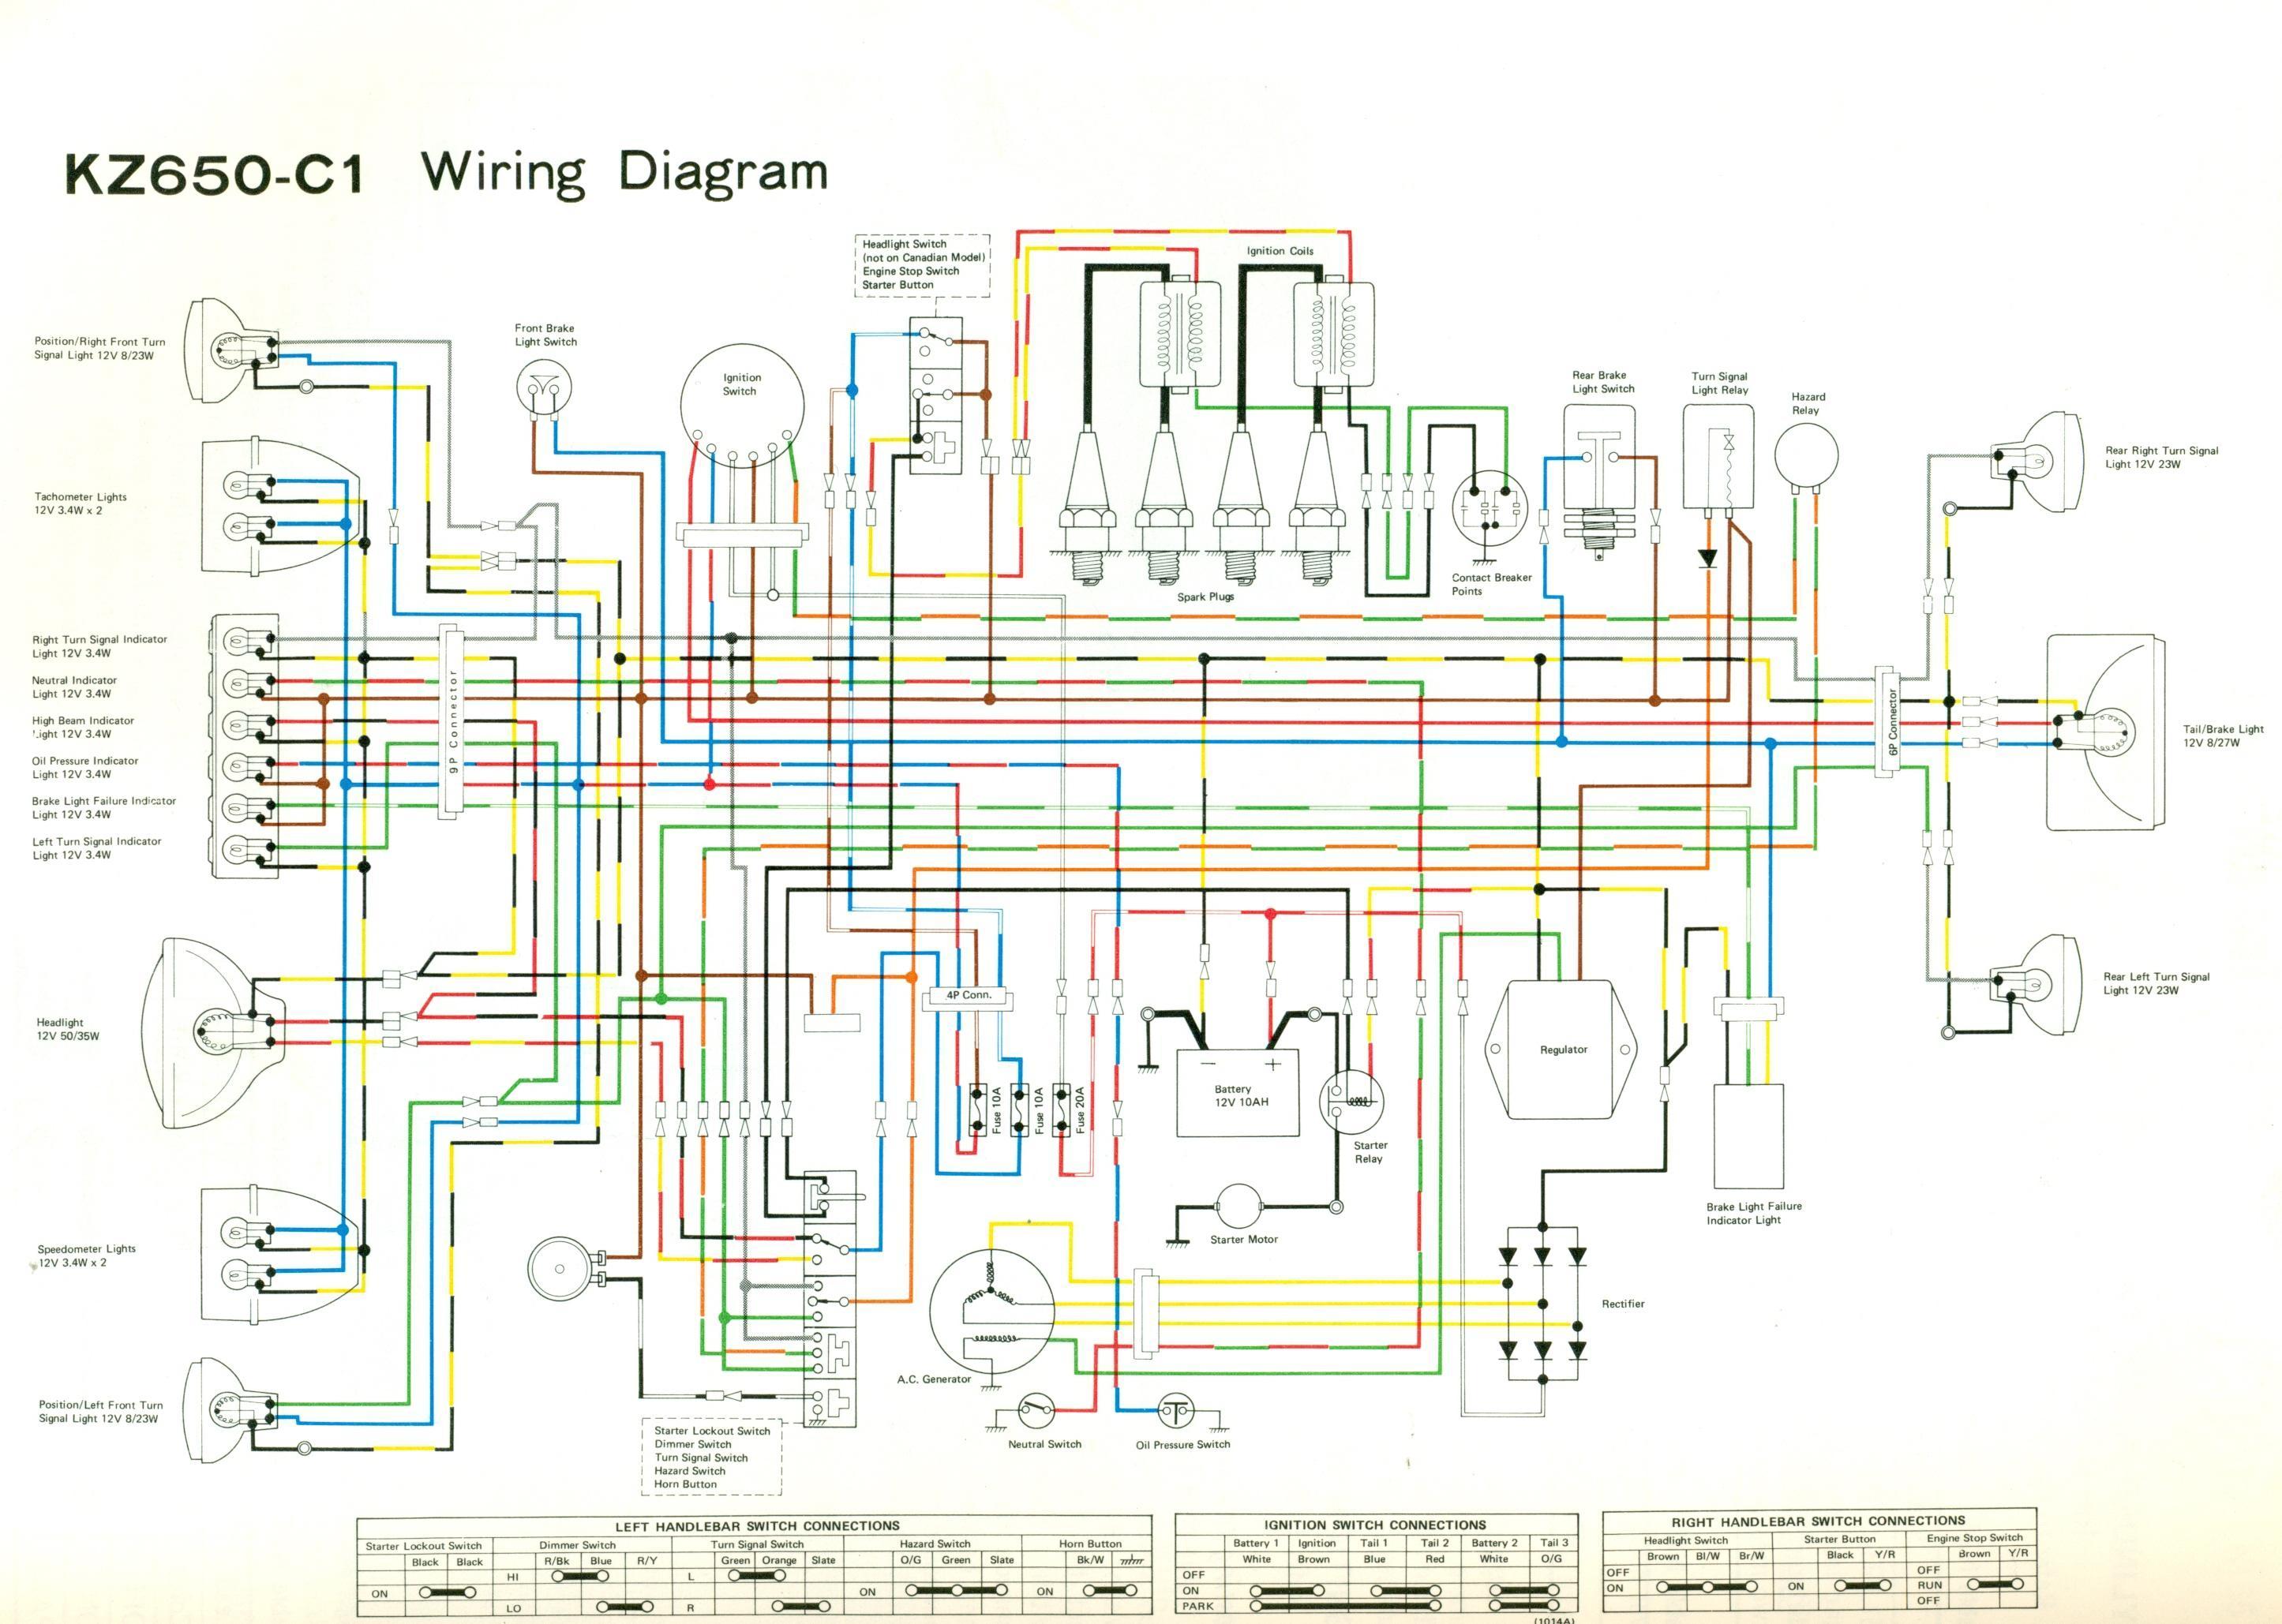 Kawasaki Versys 650 Wiring Diagram Complete Wiring Diagram